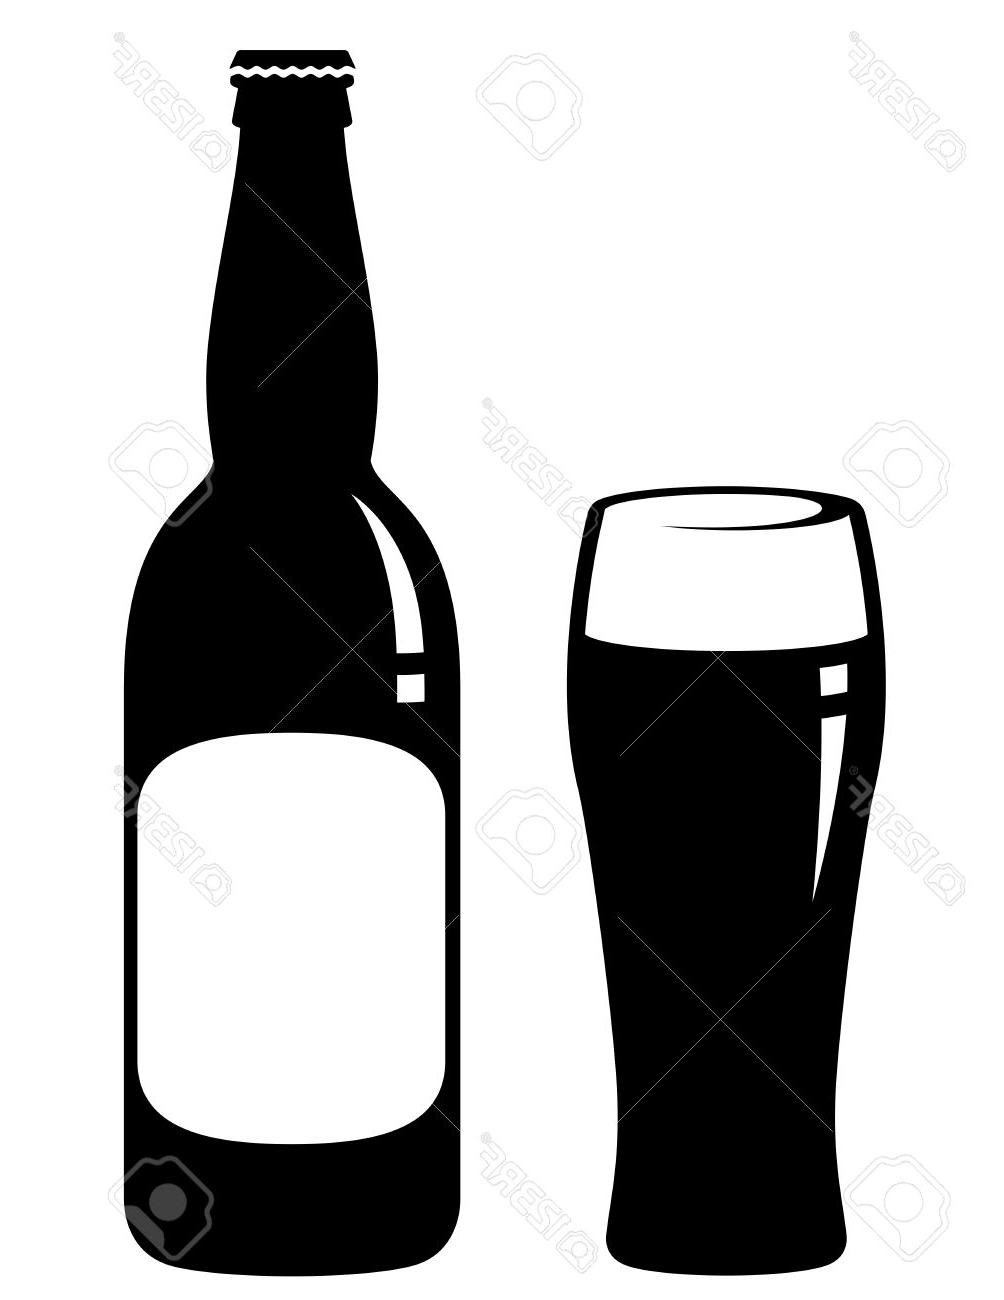 1004x1300 Black Clipart Beer Bottle